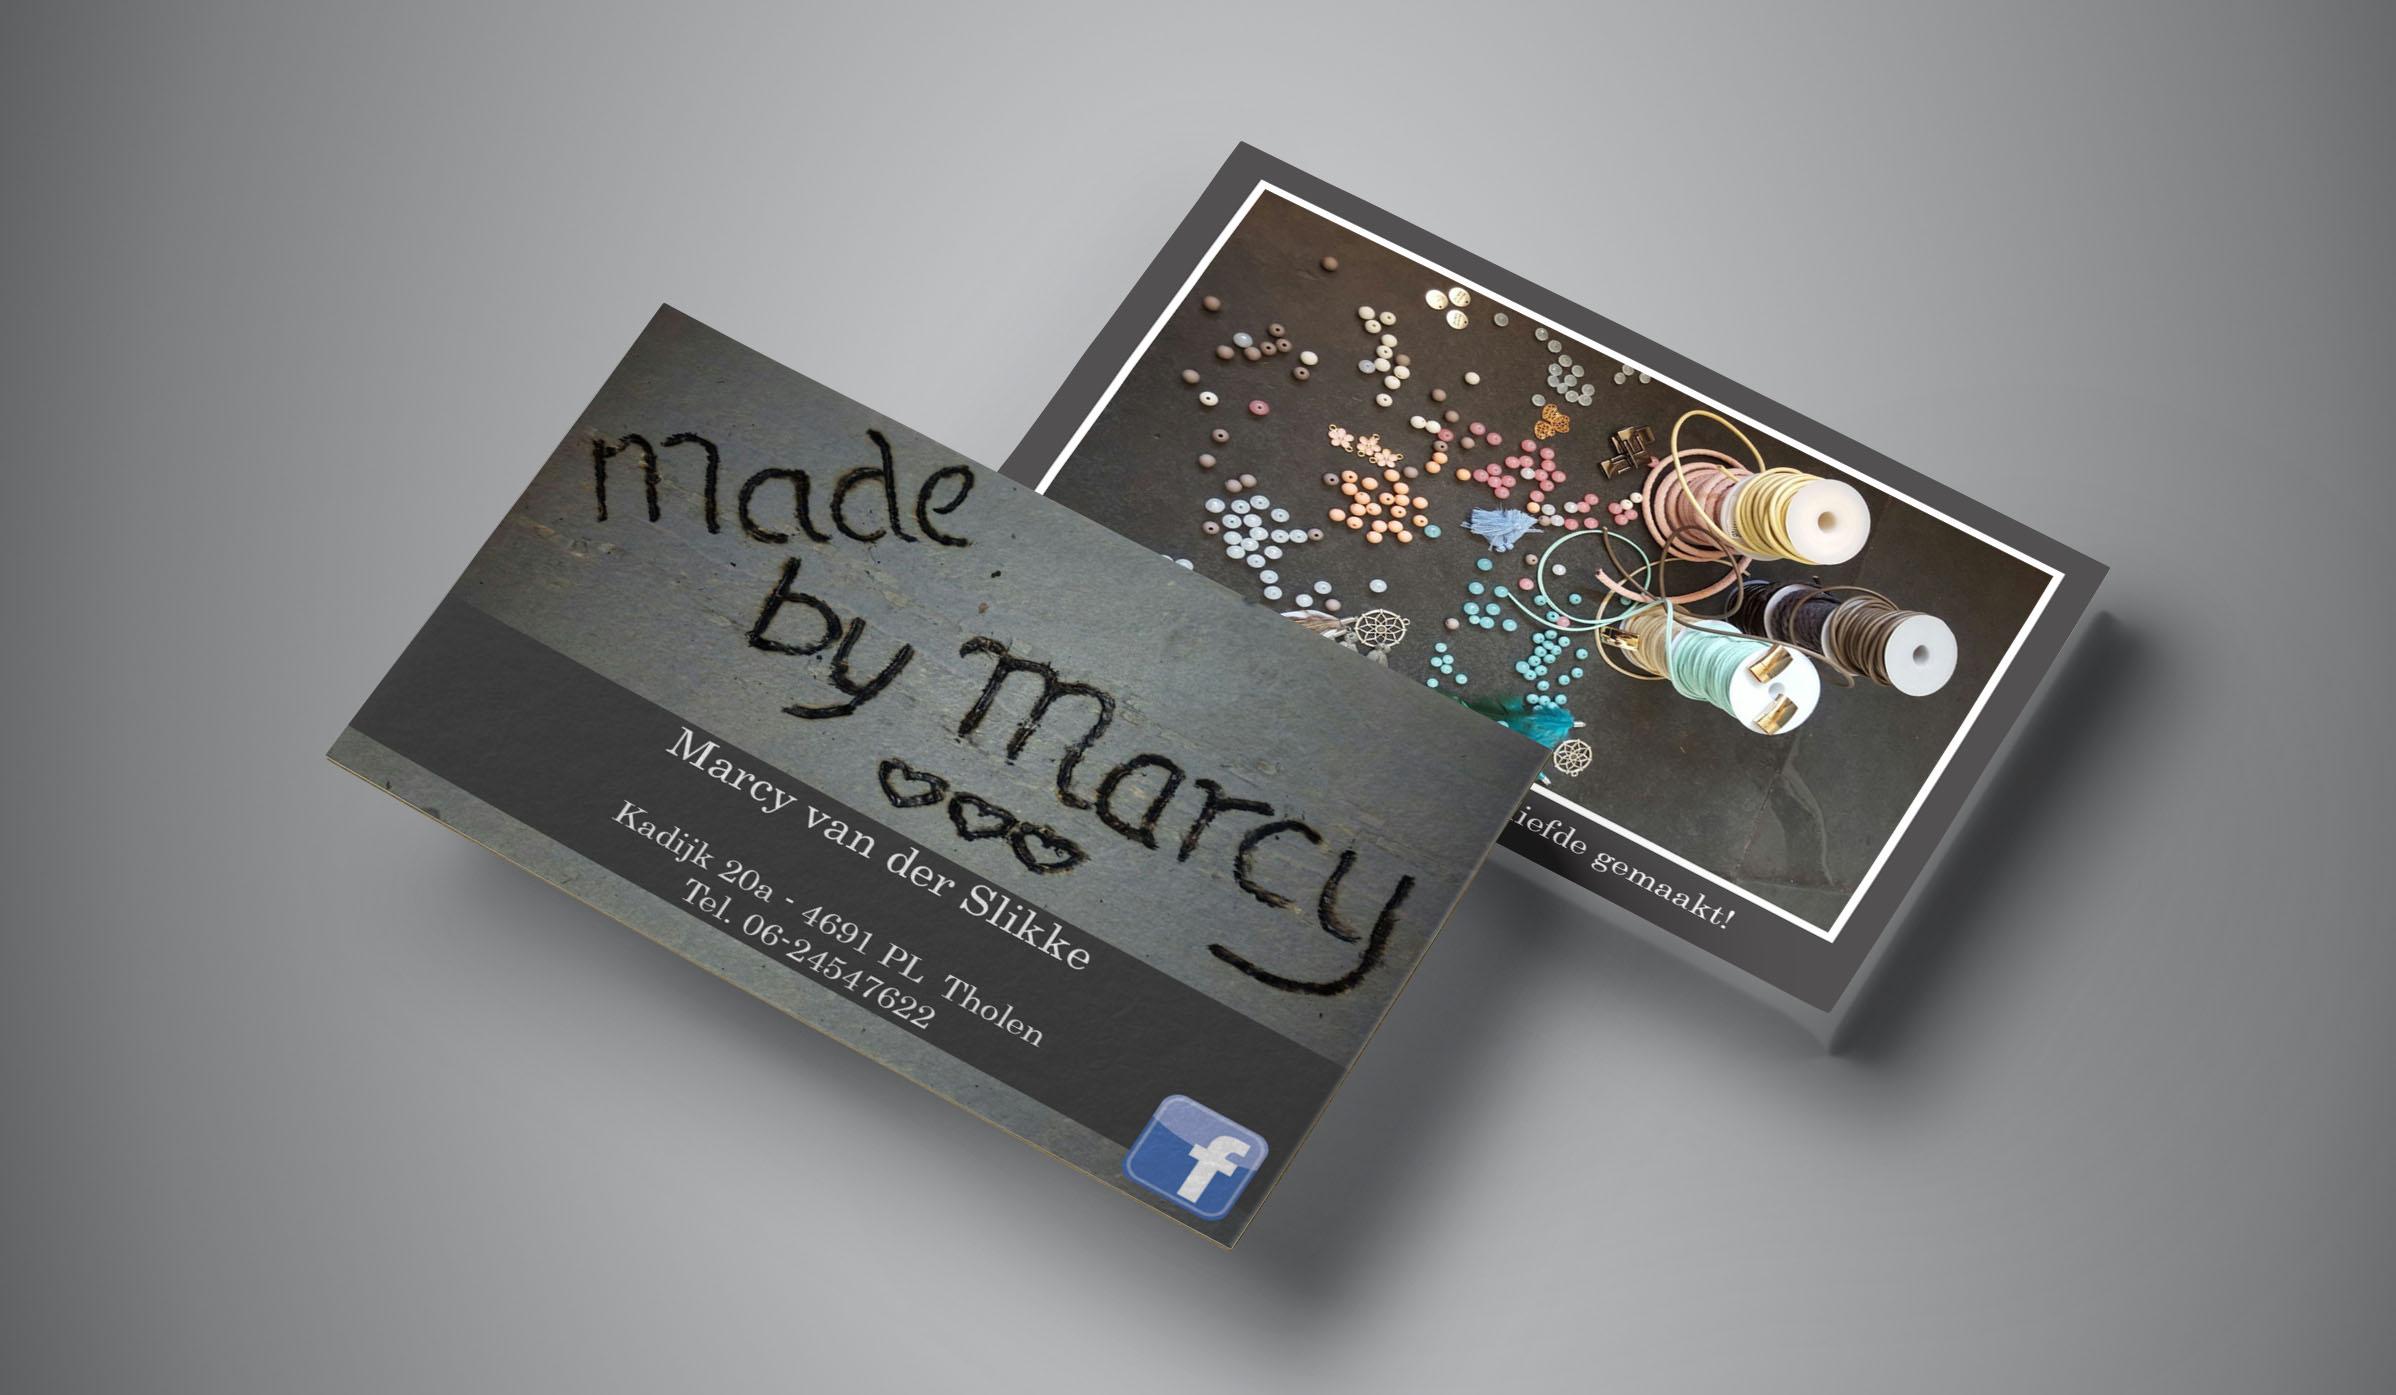 Marcy van der Slikke - Tholen